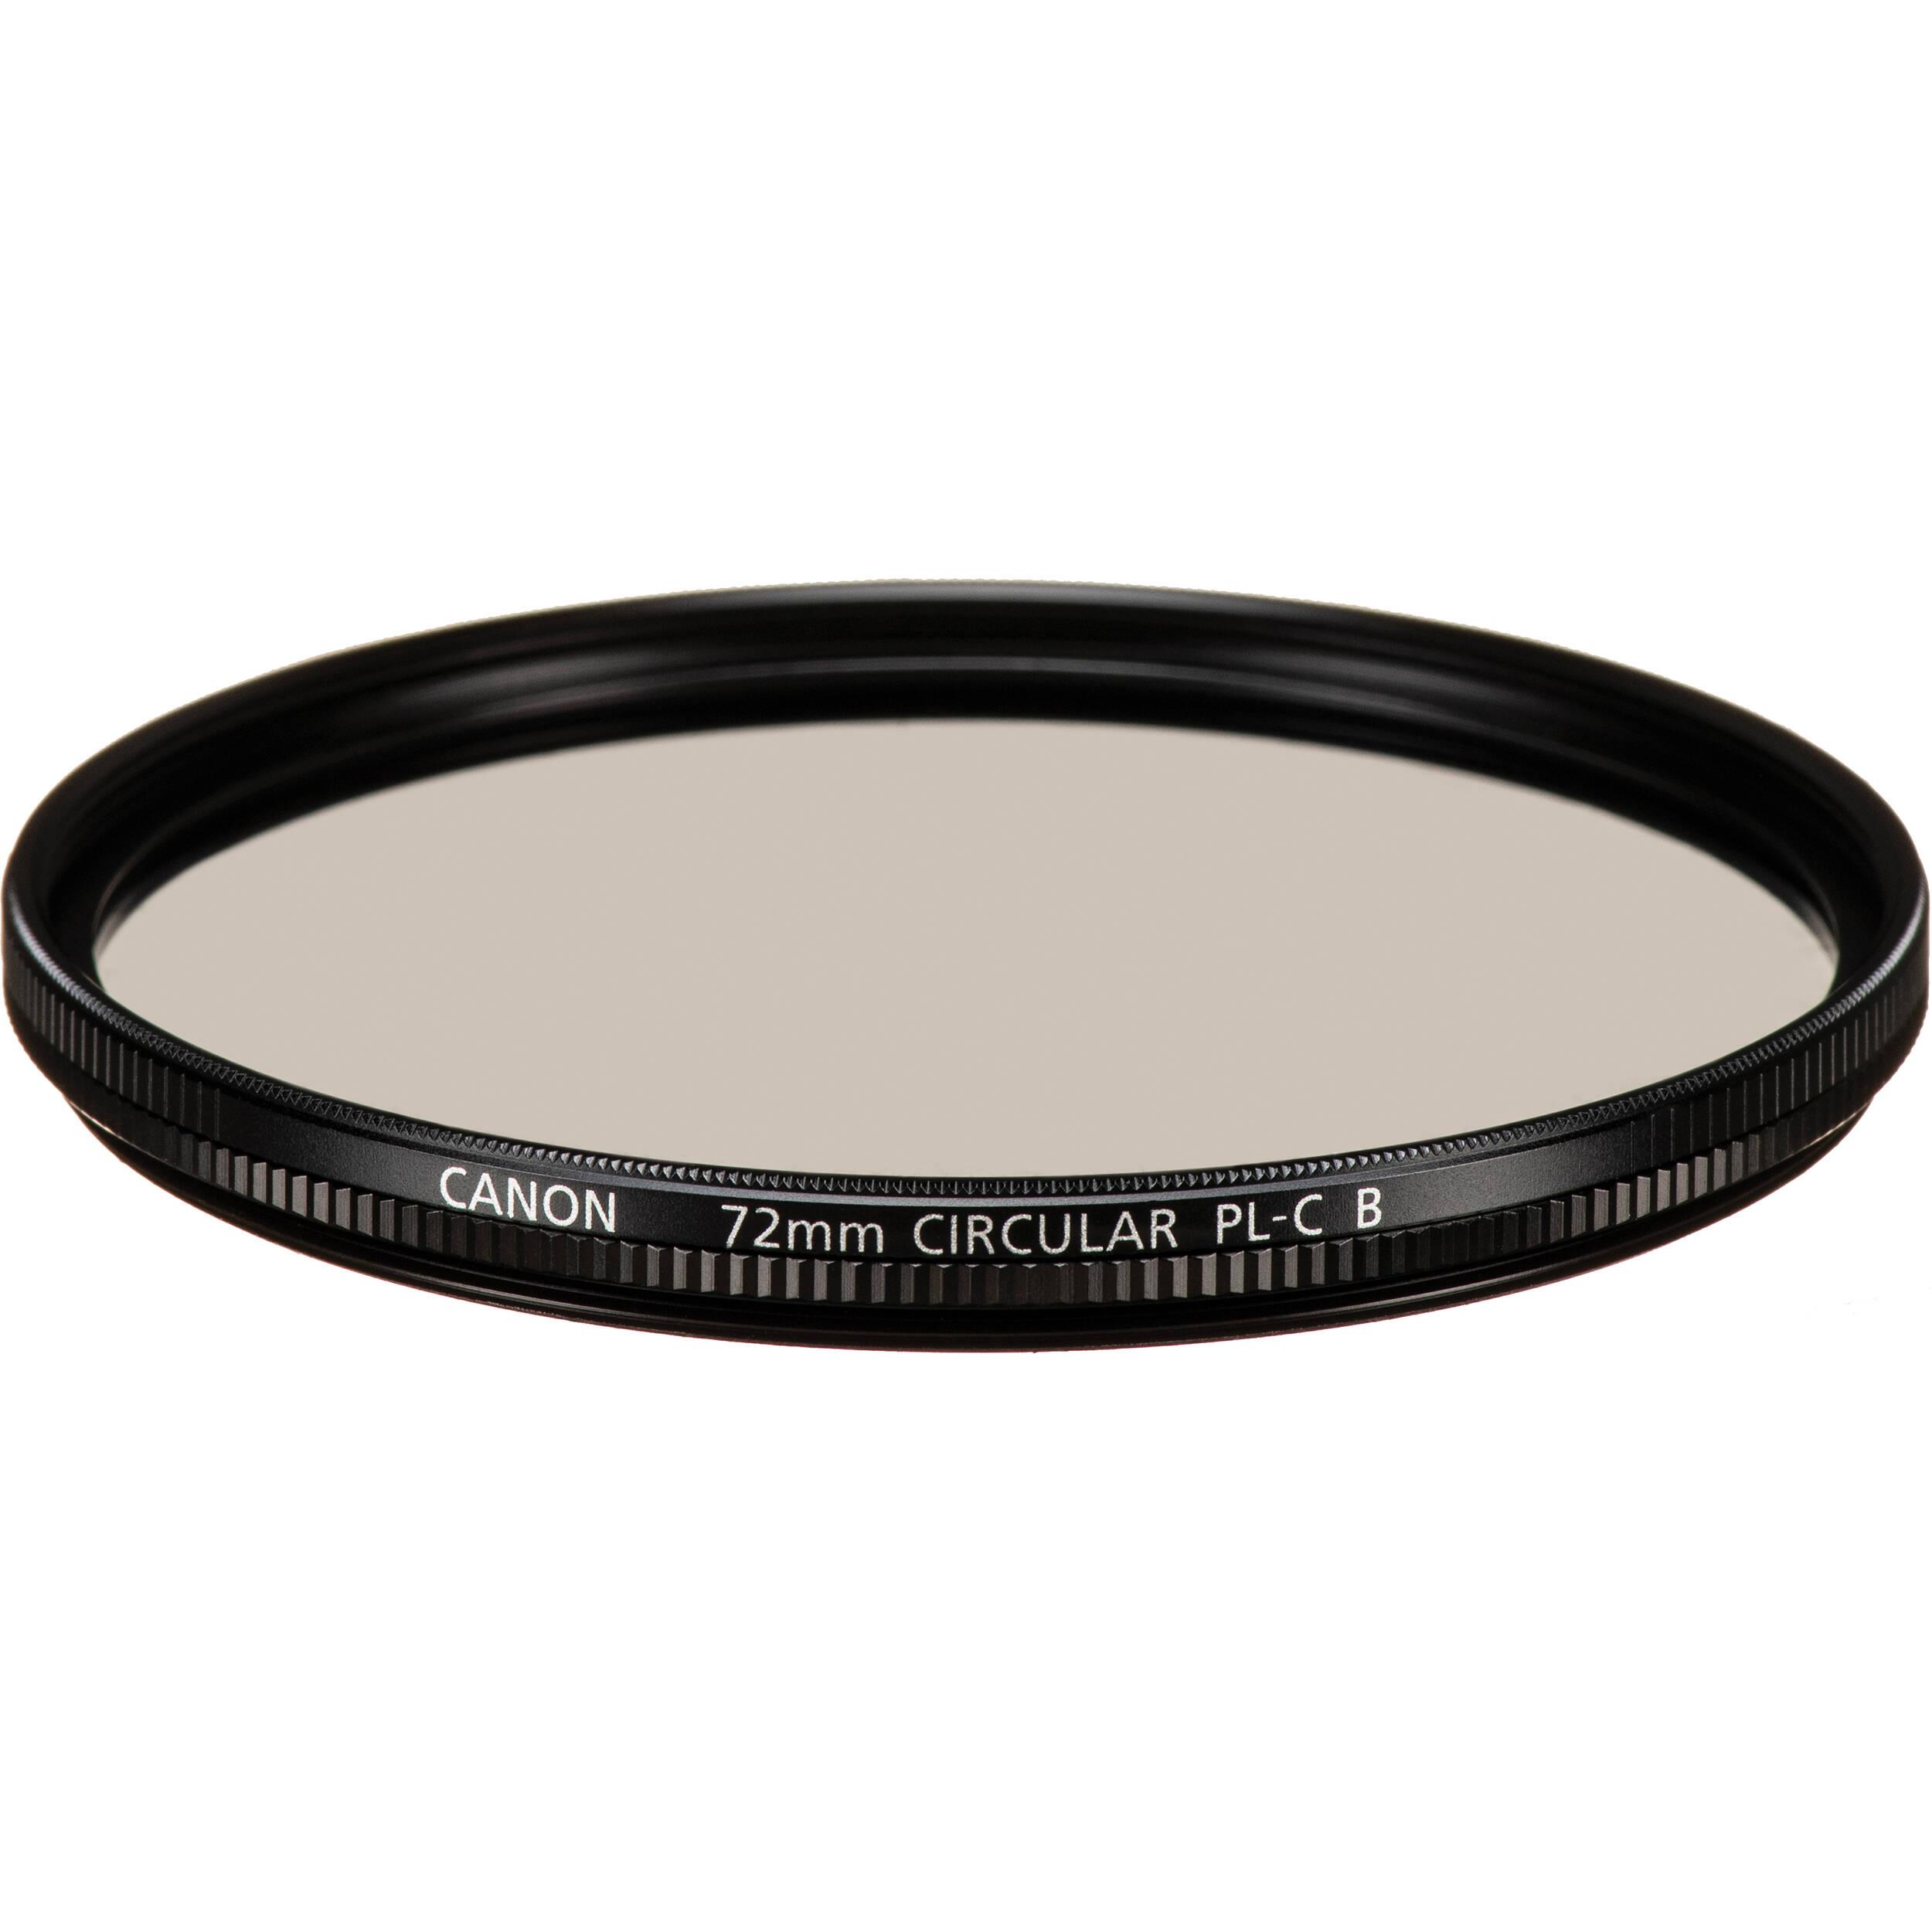 Best Circular Polarizing Filter: Canon SLR Lens Talk Forum ...